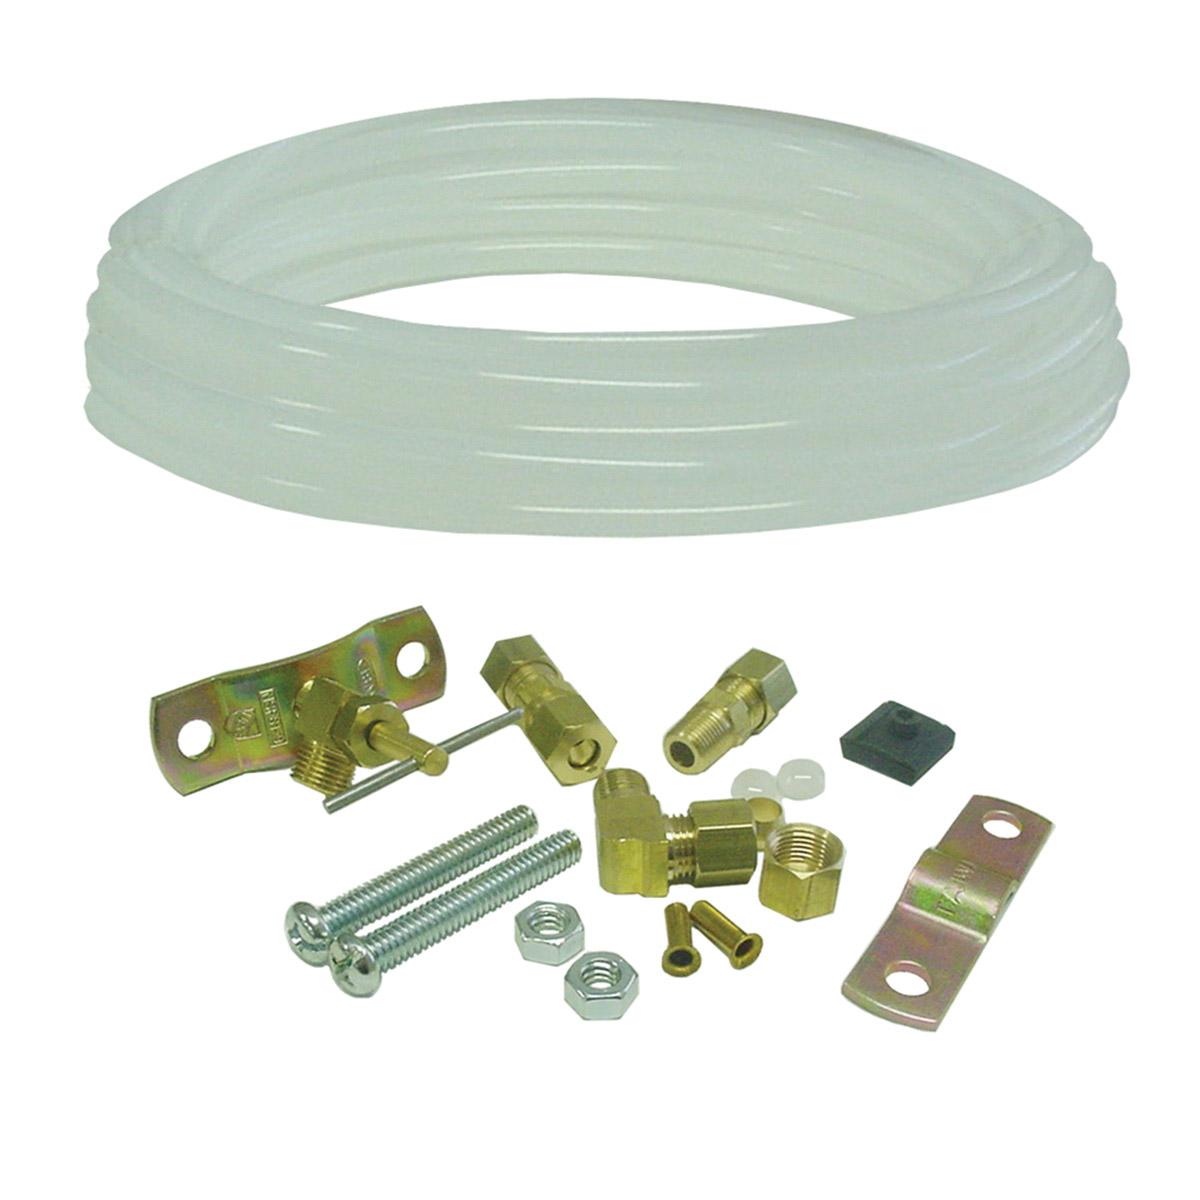 Kissler AB88-6025 Tubing Kit, 25 ft L, Plastic